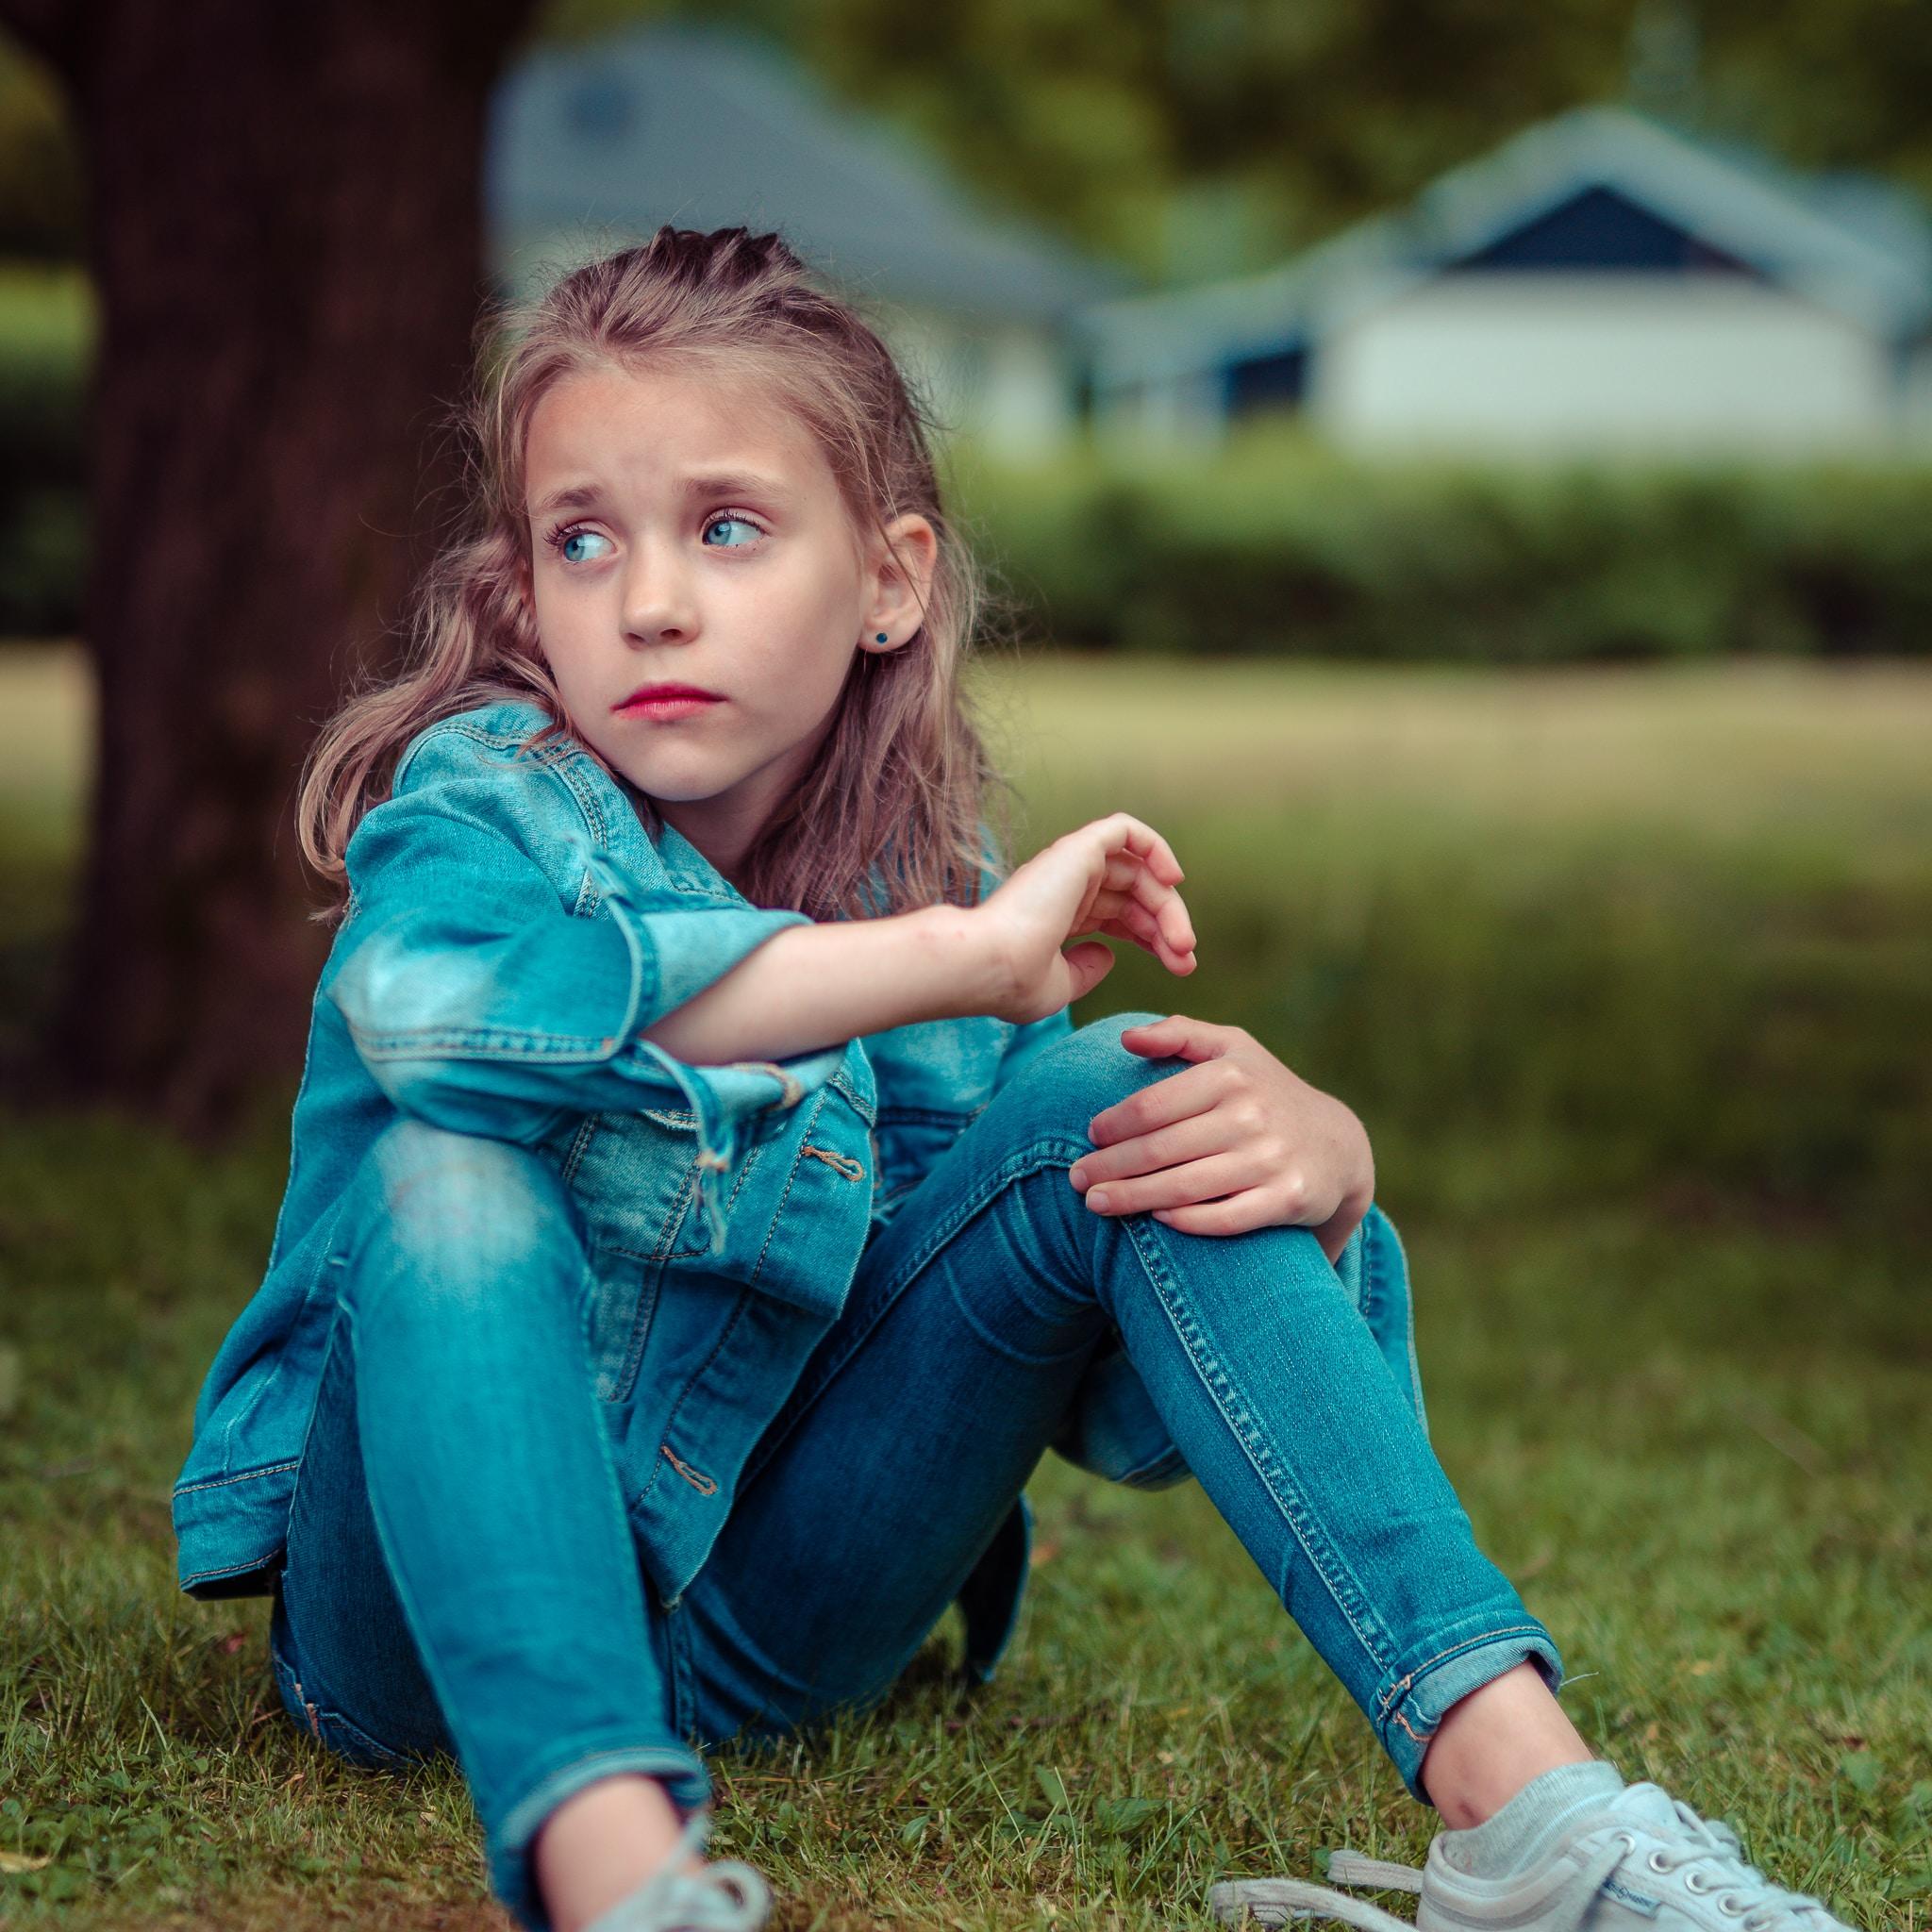 A child sat alone looking sad.